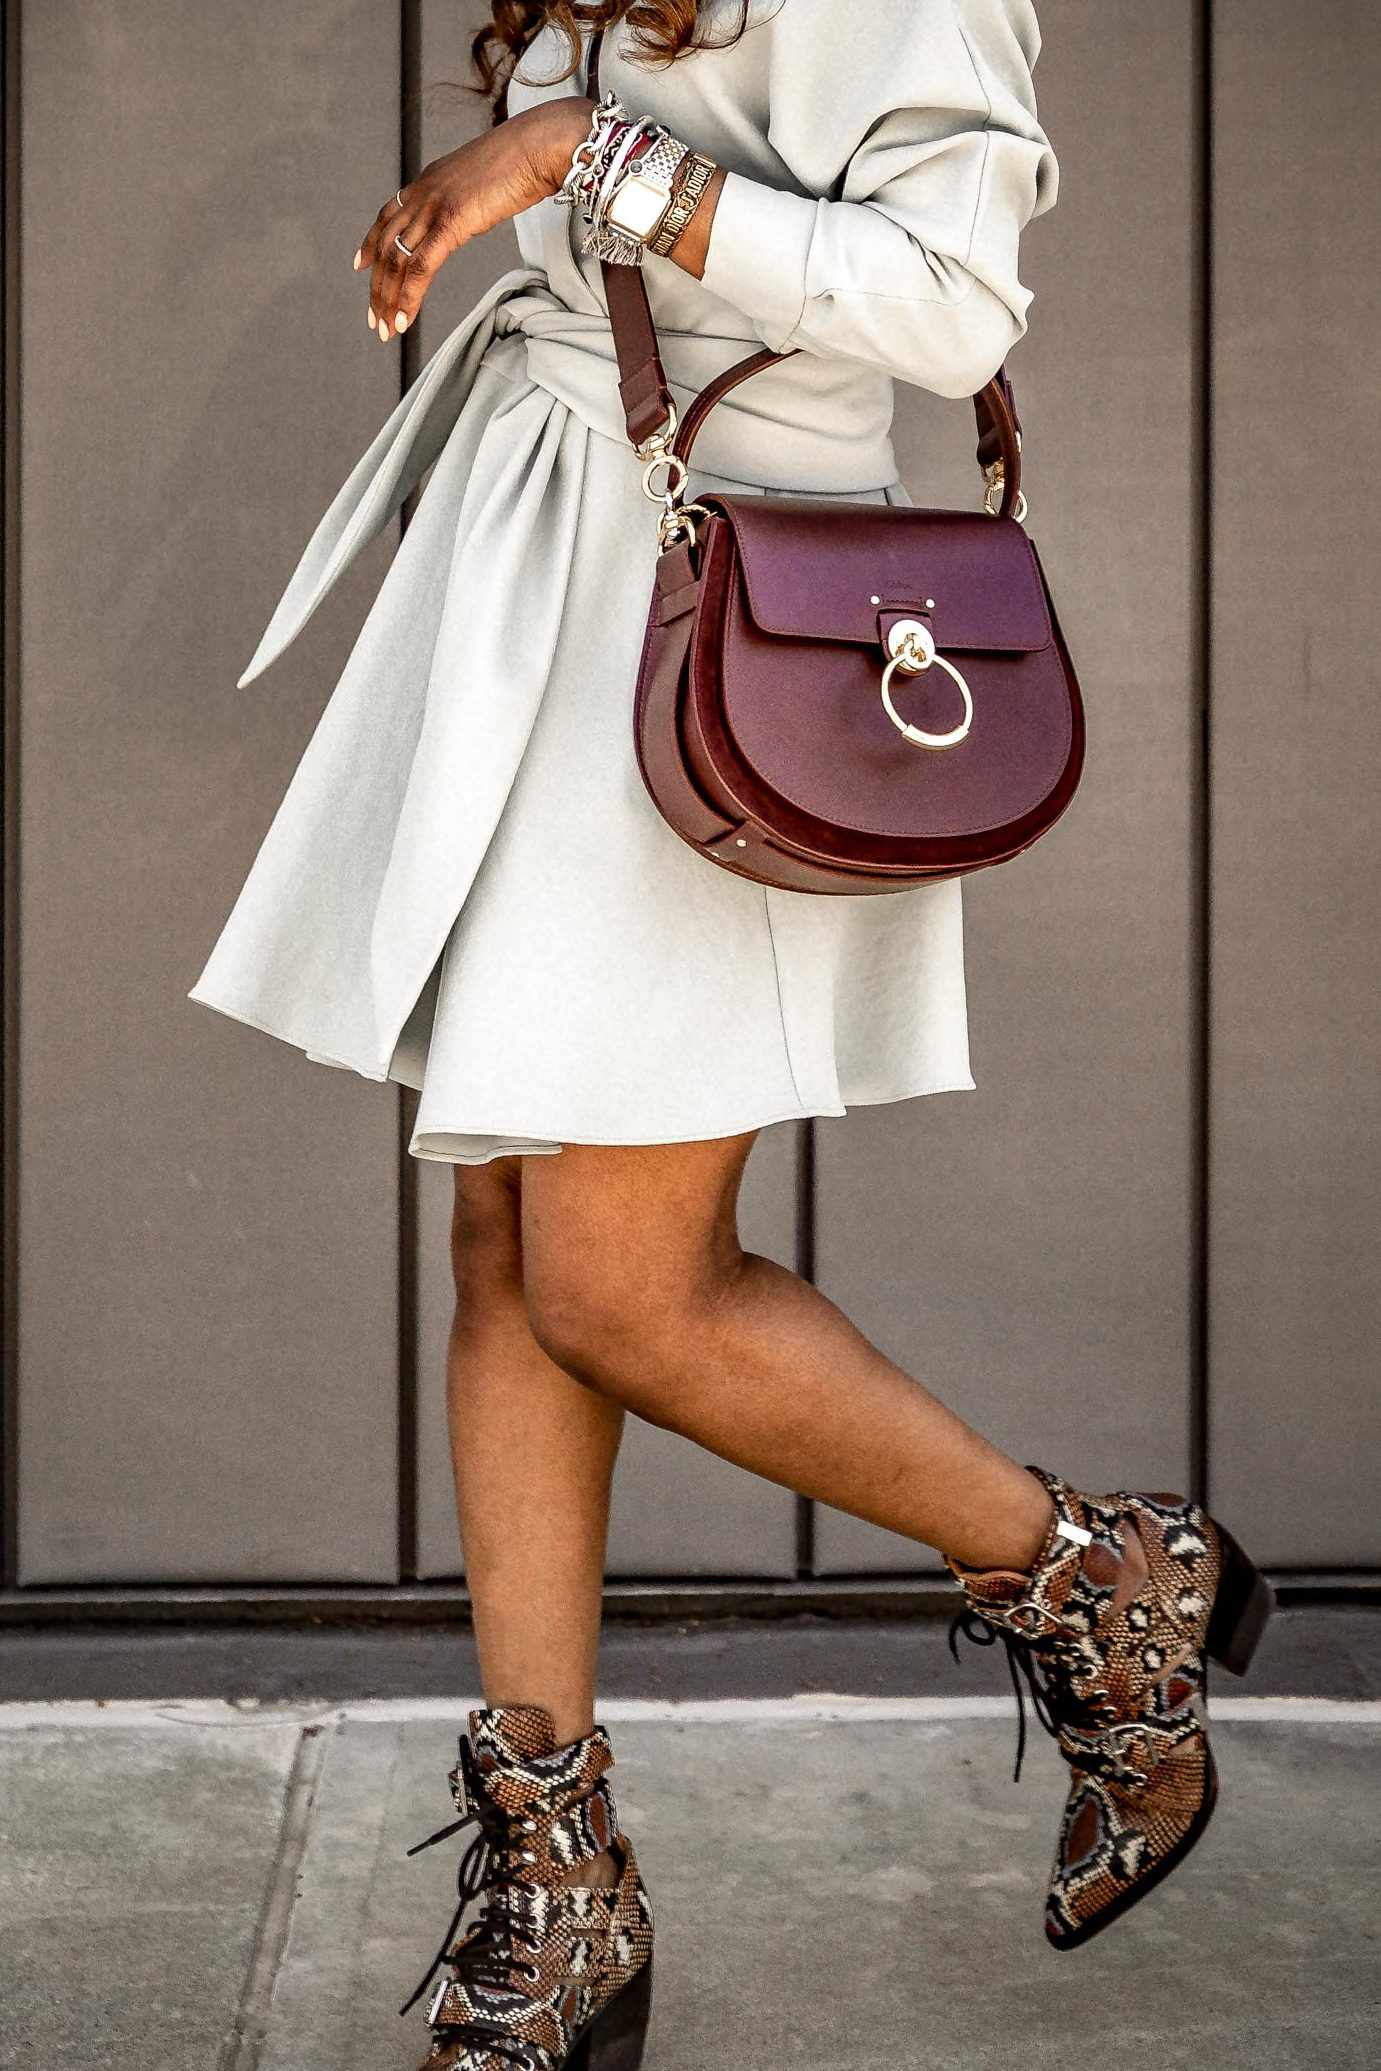 Atlanta fashion blogger Monica Awe-Etuk wearing tibi wrap dress, chloe snake boots, Chloé - Medium Tess Leather Saddle Bag for spring. The best spring dresses